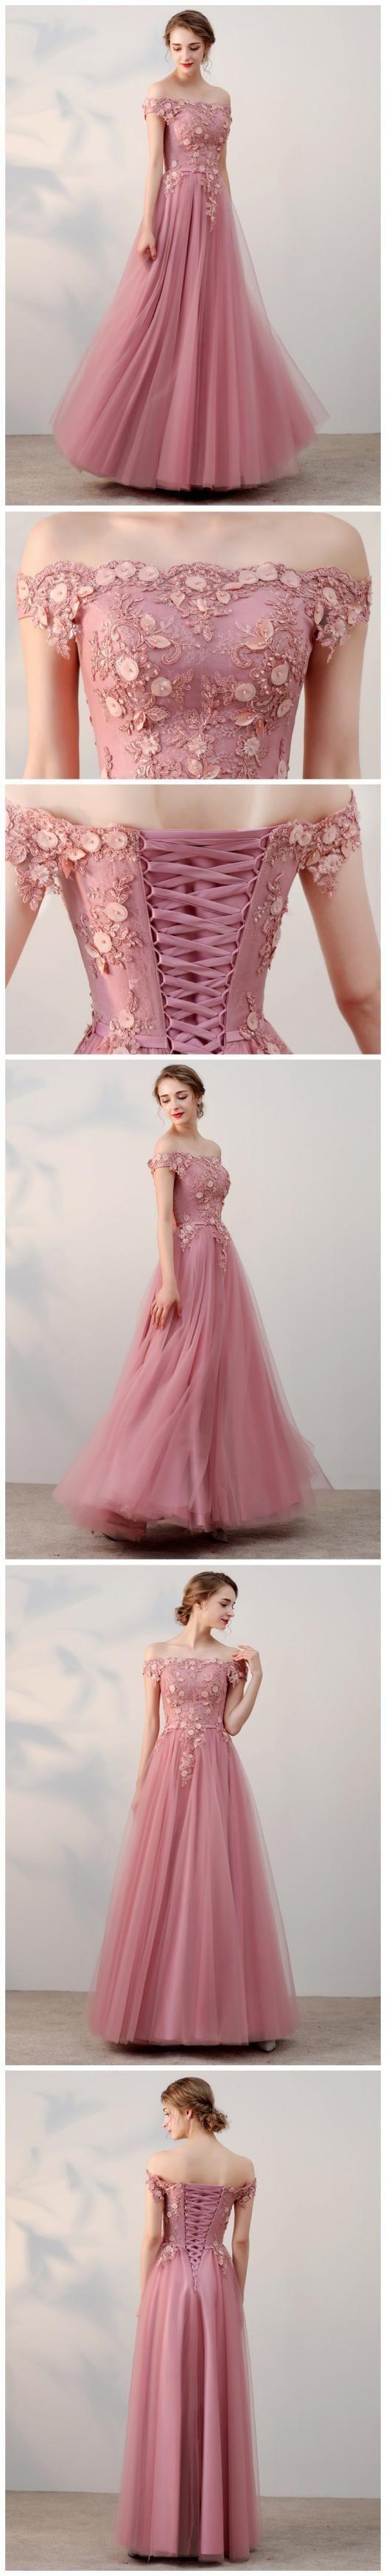 Chic aline offtheshoulder pink applique tulle modest long prom